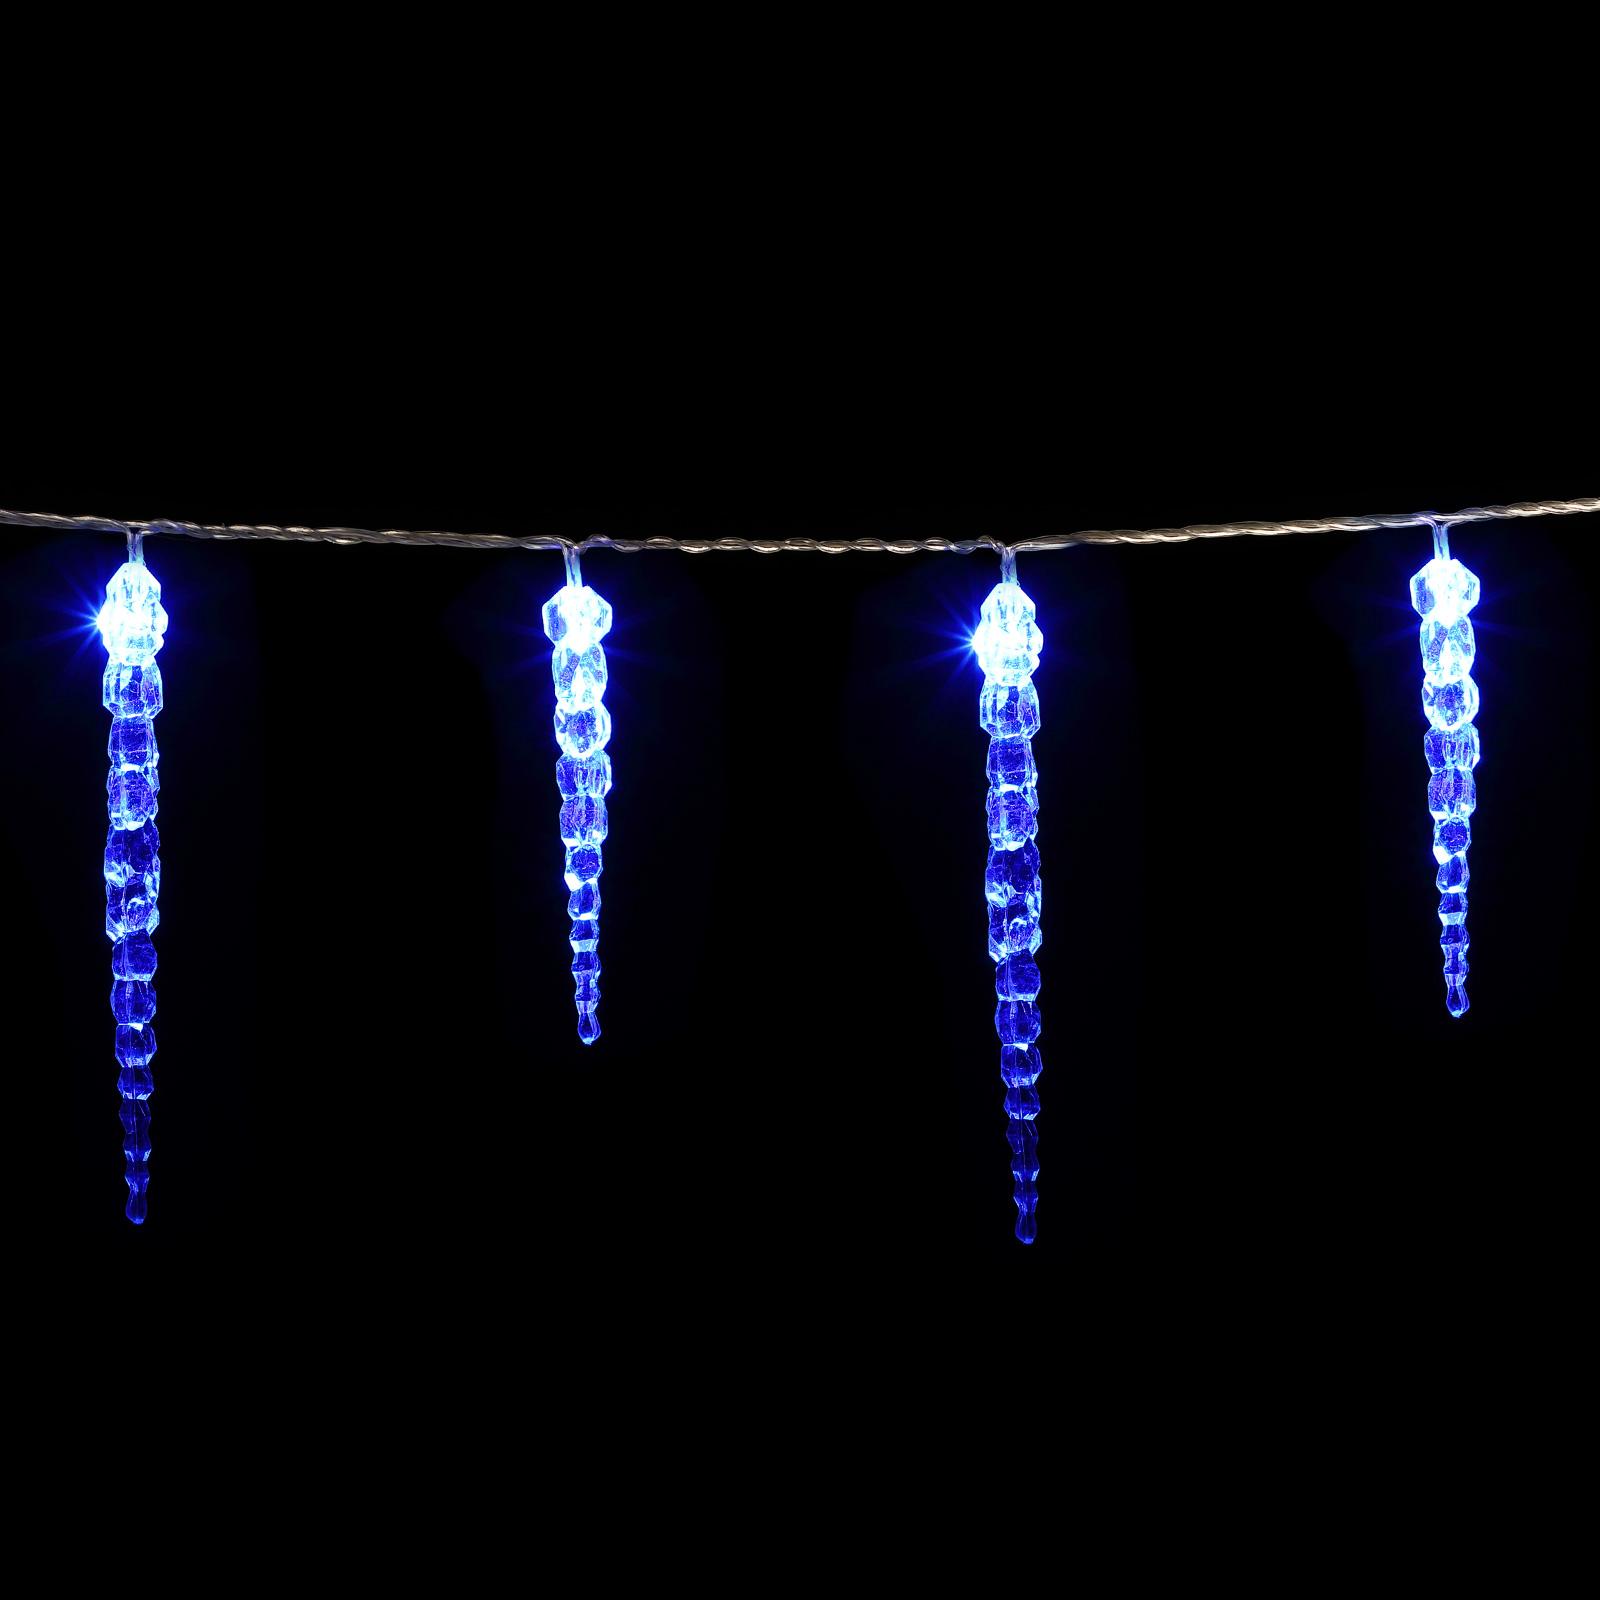 40 led lichterkette eiszapfen fensterdeko winter for Illumination exterieur